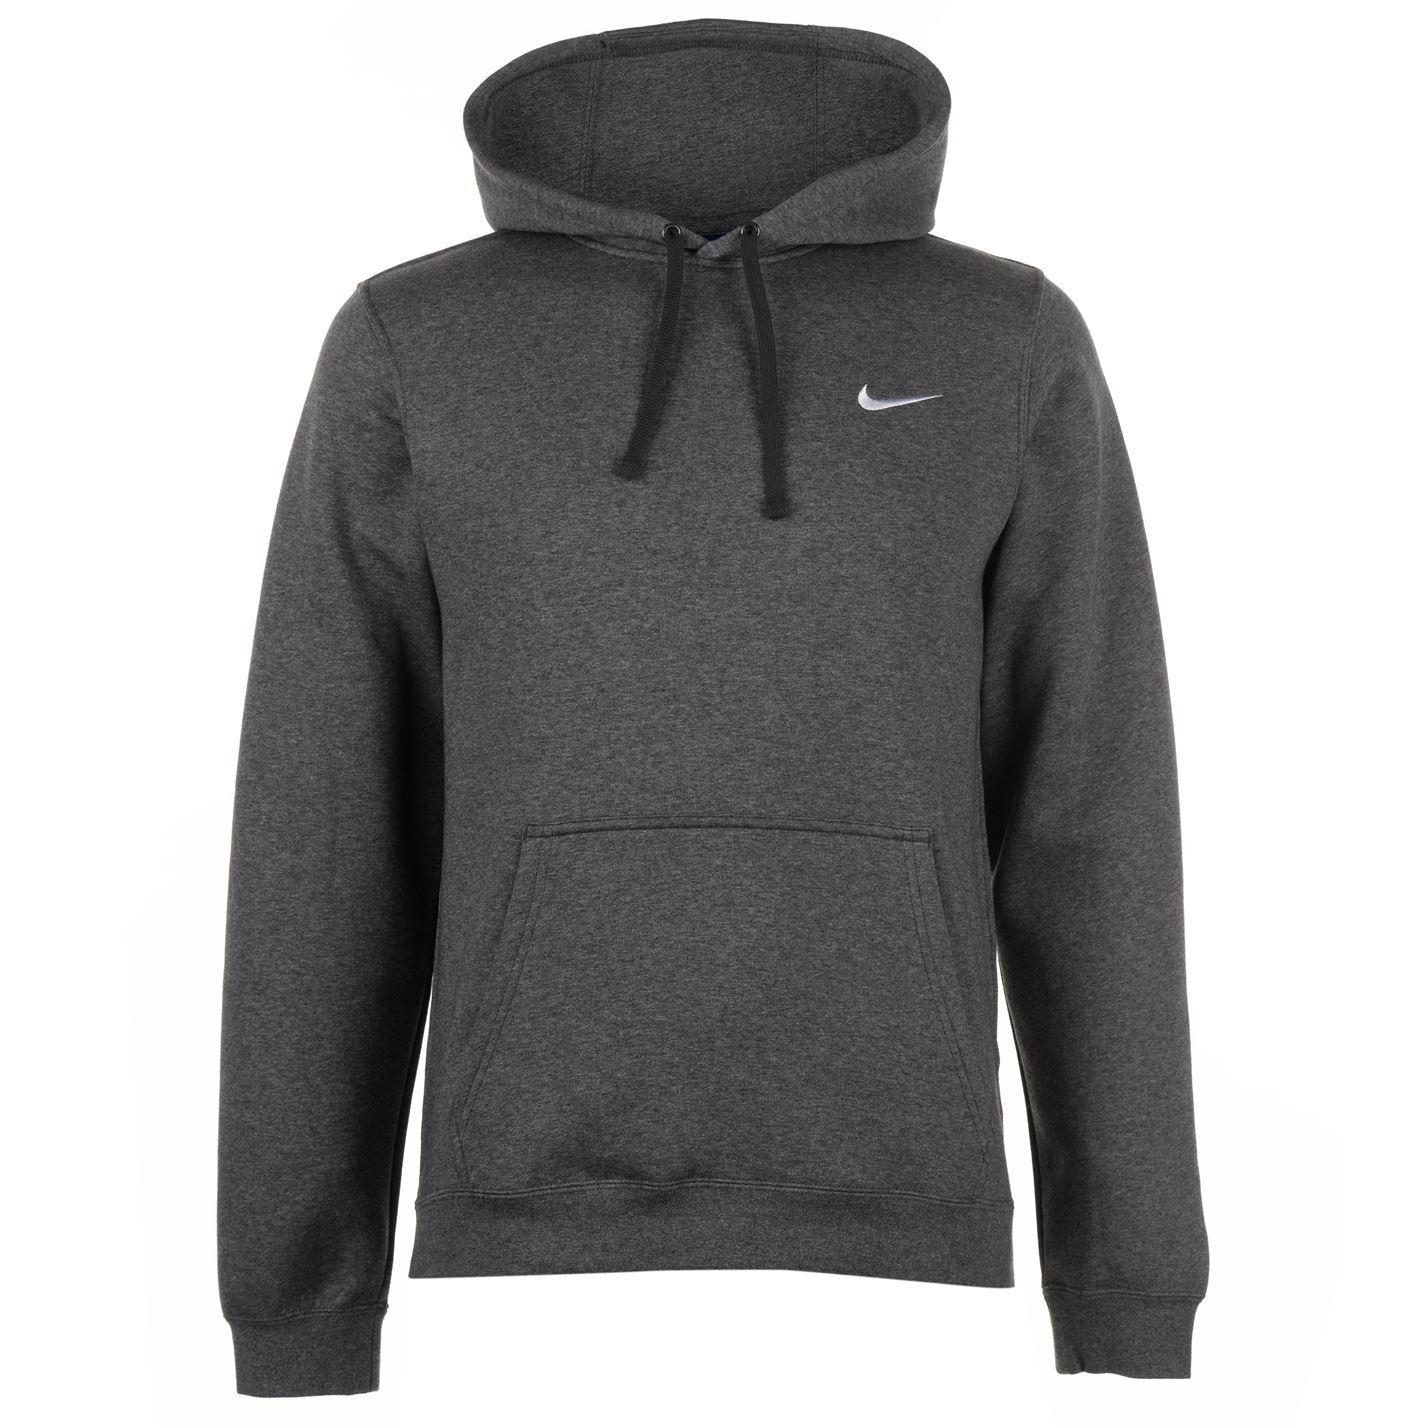 Nike-Fundamentals-Fleece-Lined-Pullover-Hoody-Mens-OTH-Hoodie-Sweatshirt-Sweater thumbnail 16